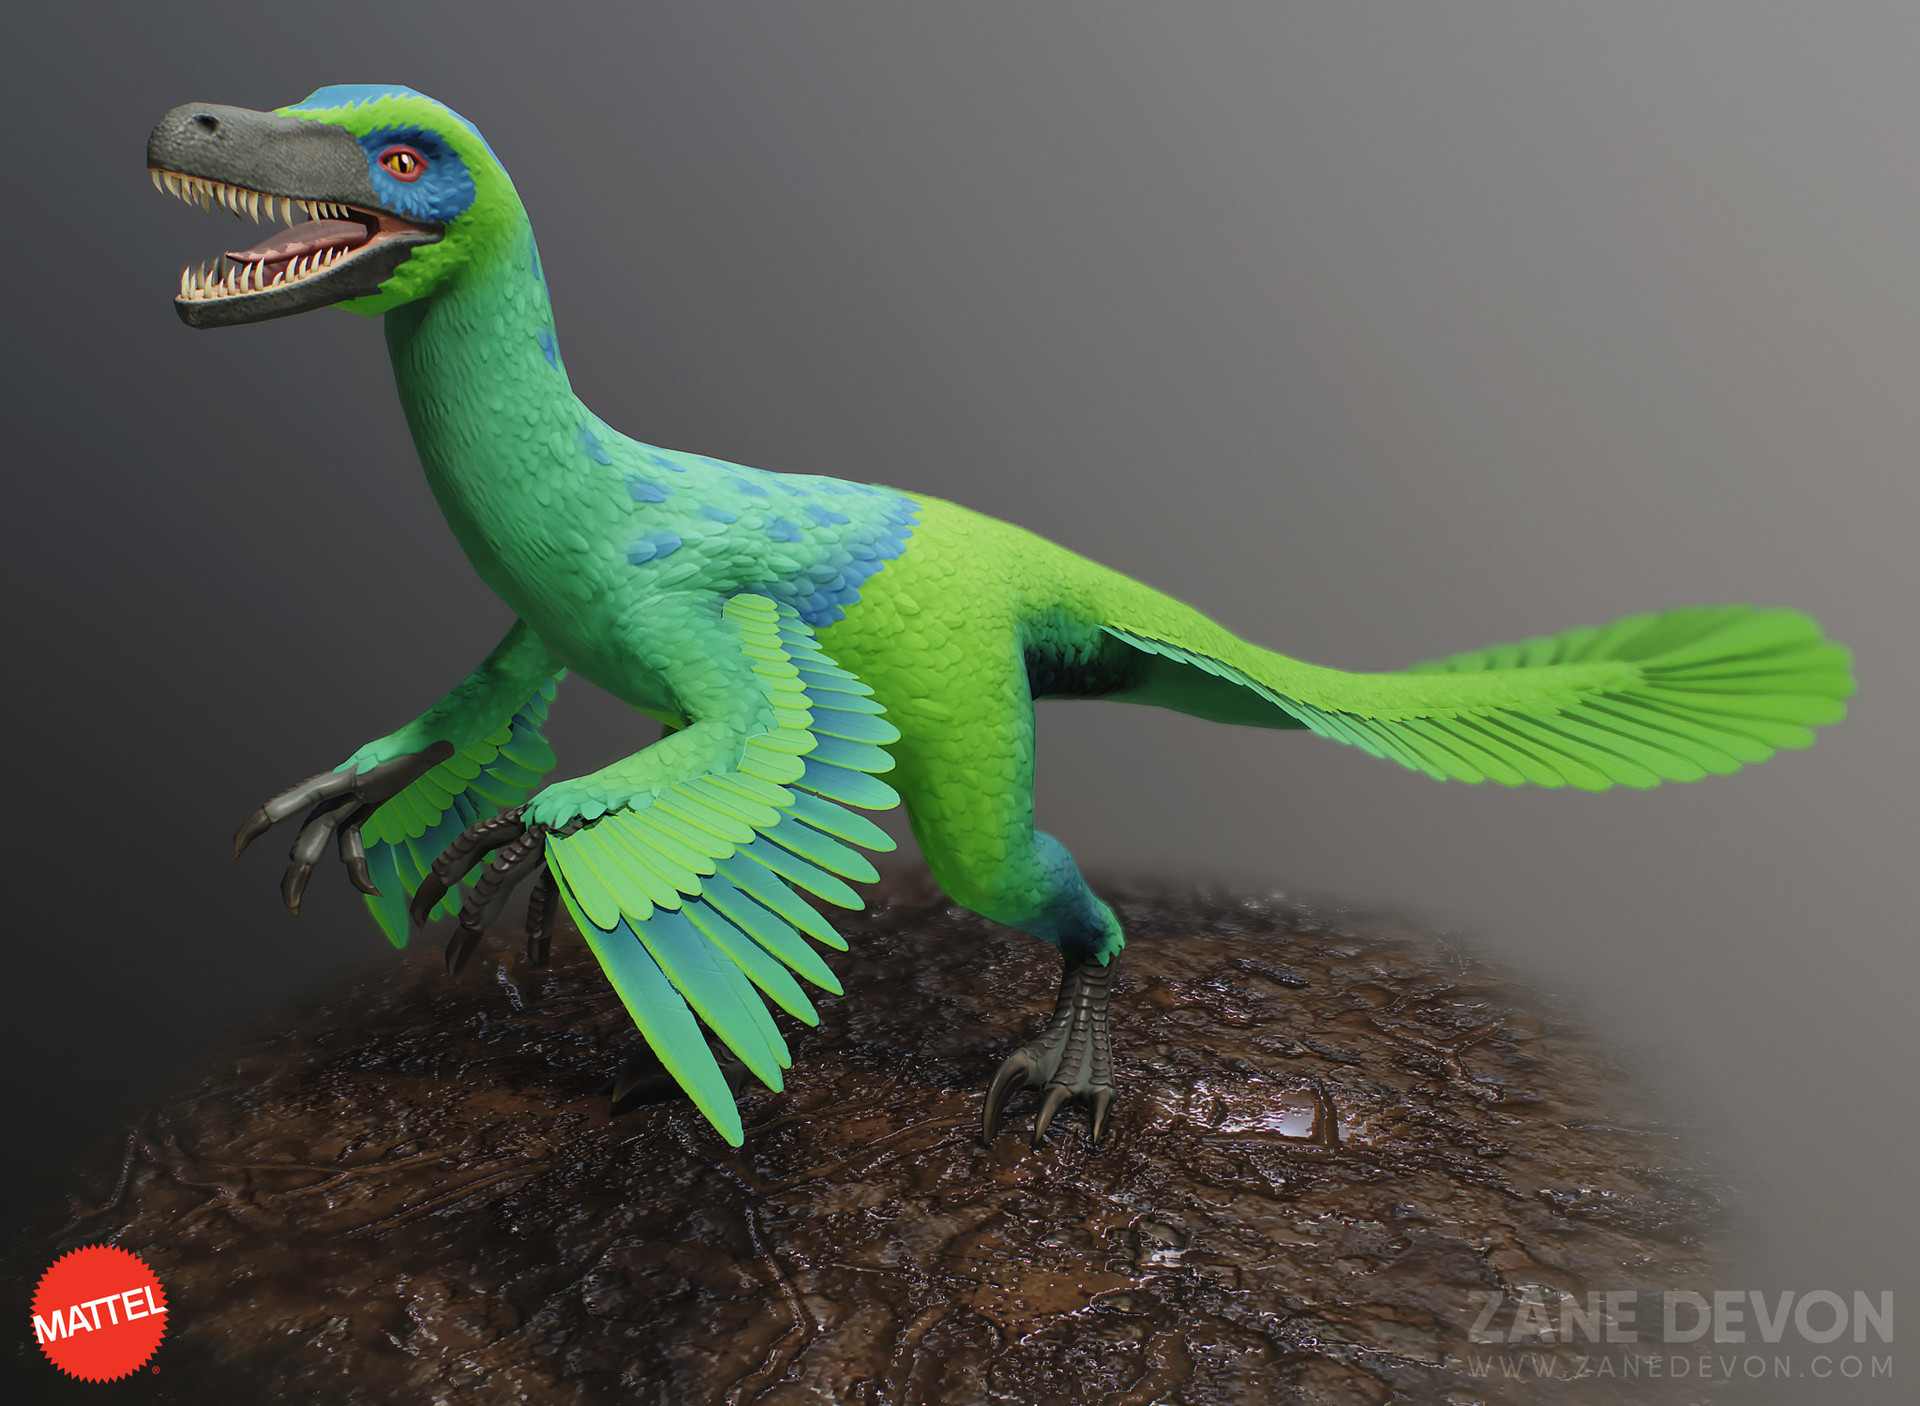 zane-devon-velociraptor-01